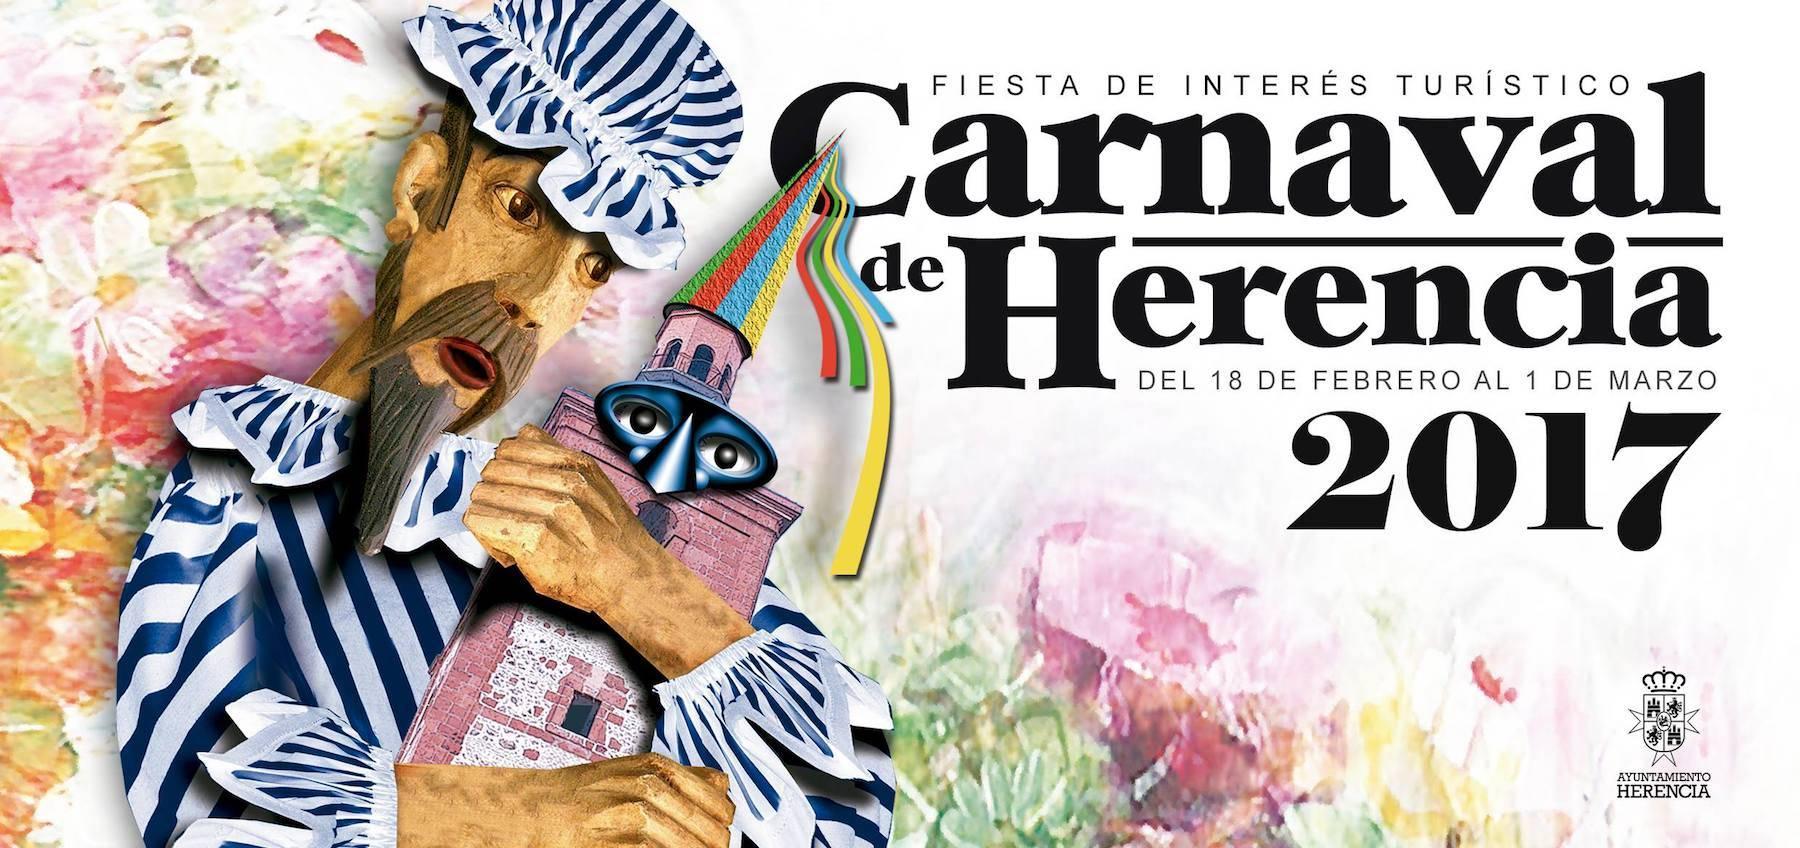 carnaval de herencia 2017 cover fb - Programa de actos de Carnaval de Herencia 2017